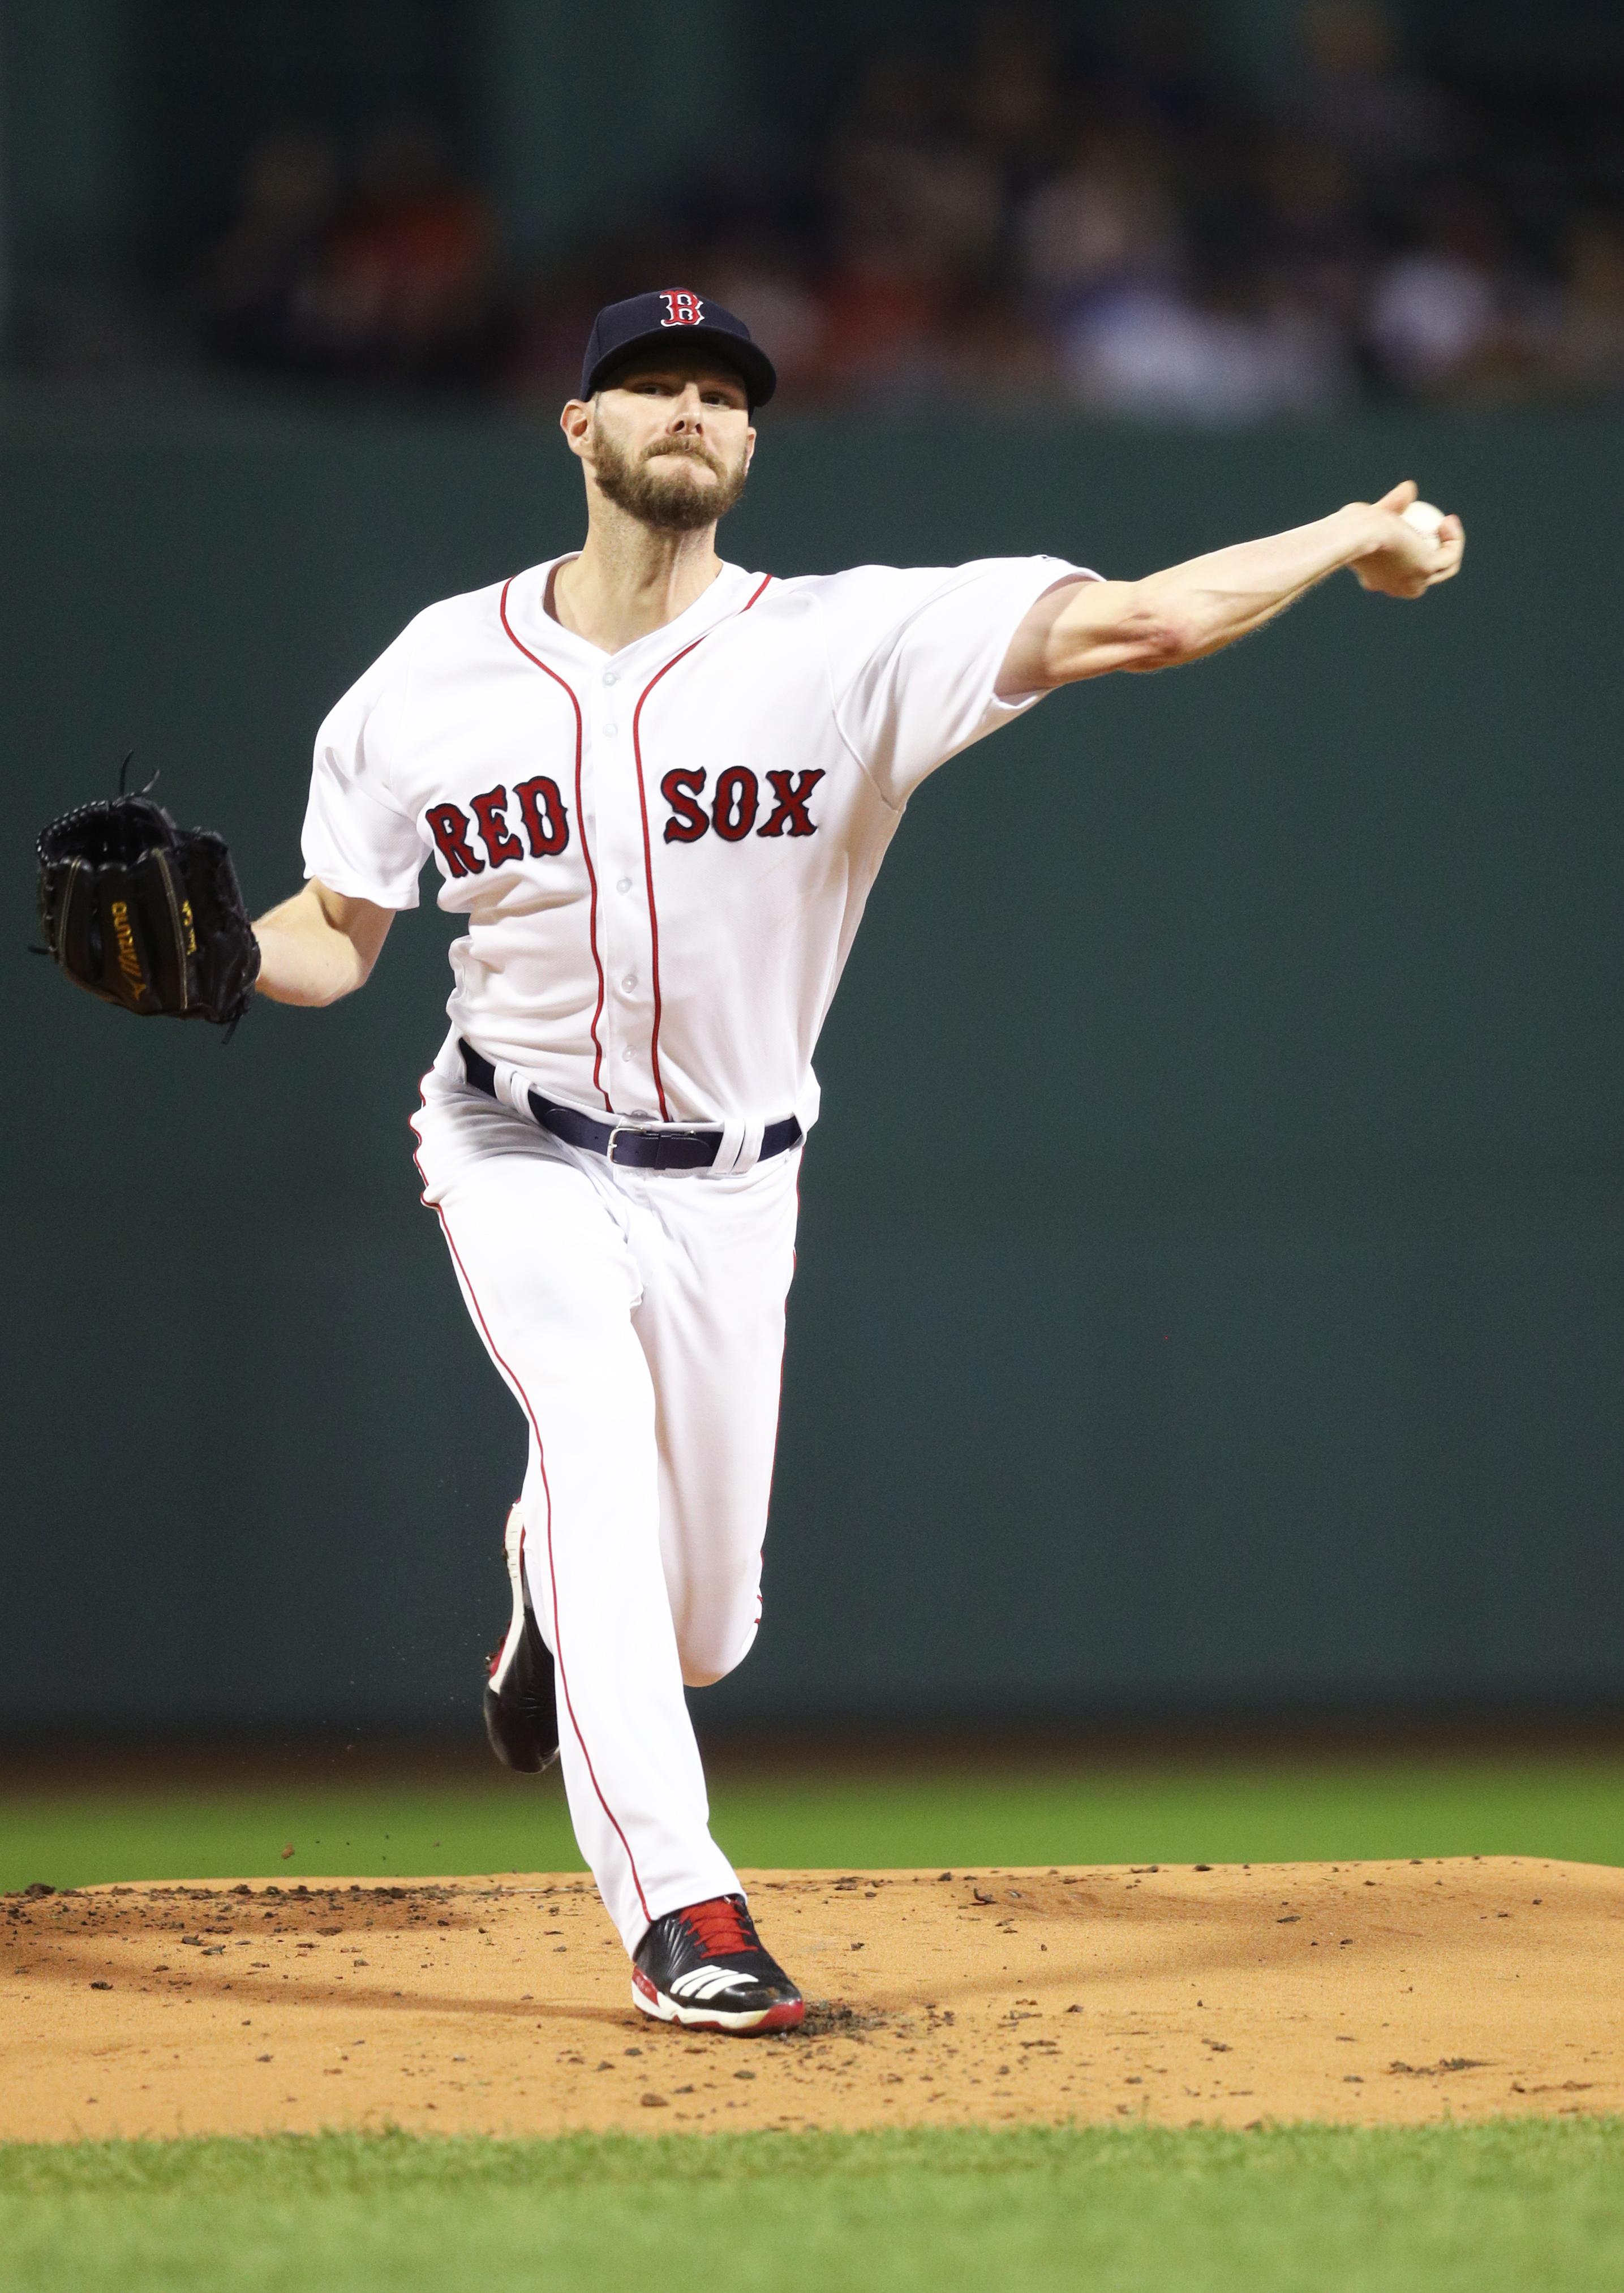 Baltimore Orioles v Boston Red Sox - Game 2